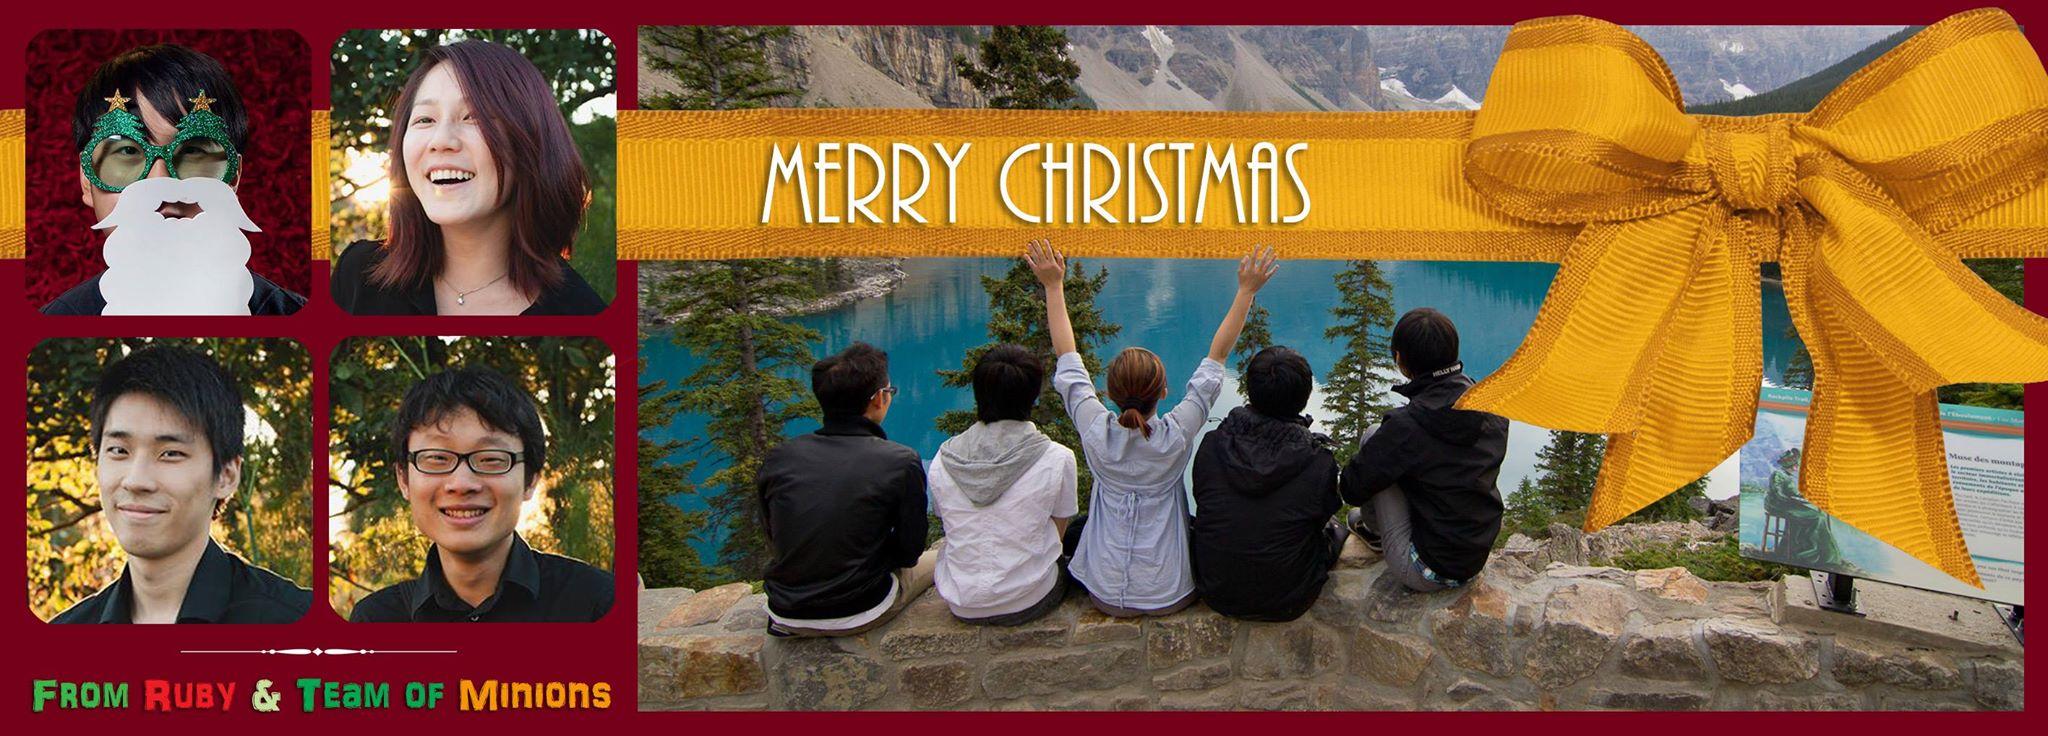 modern-romance-photographers-videgoraphers-christmas-holidays-greeting